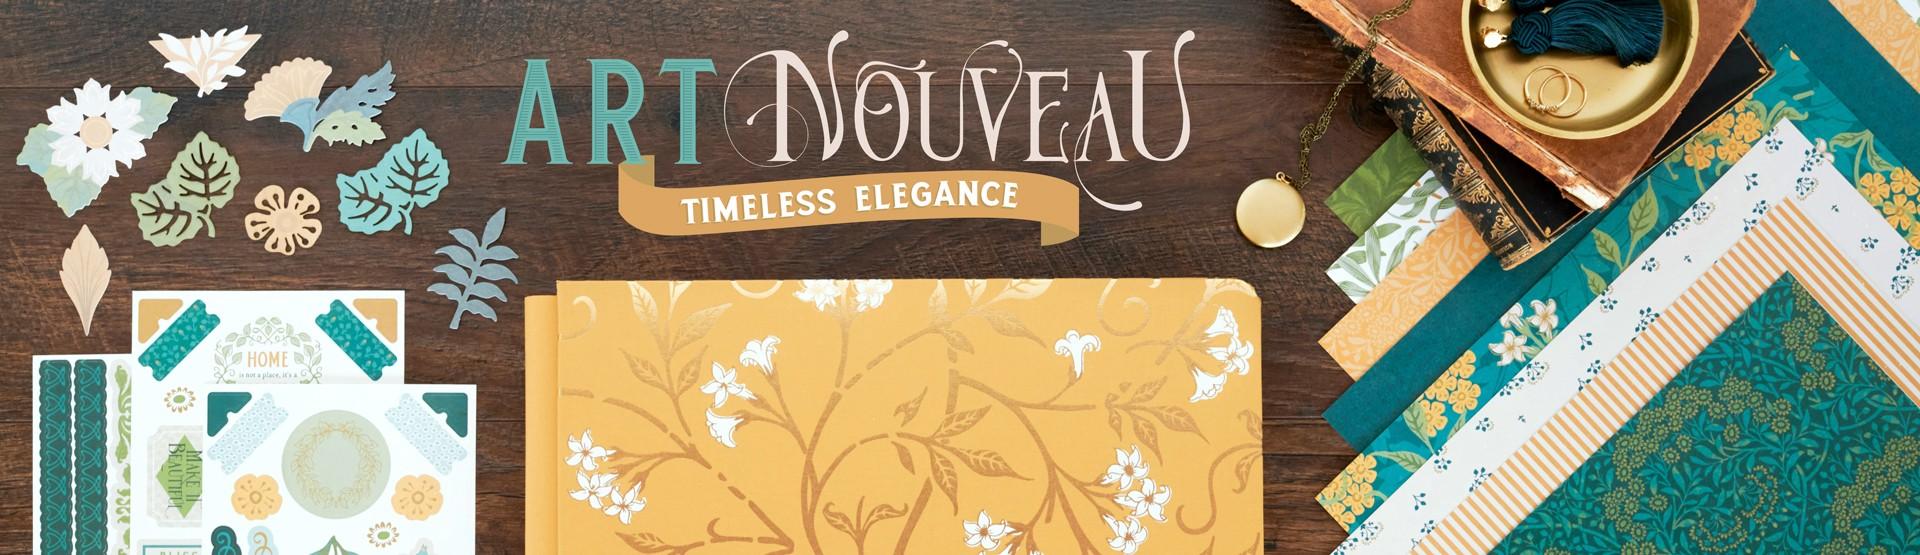 All Occasions: Art Nouveau Scrapbooking Supplies